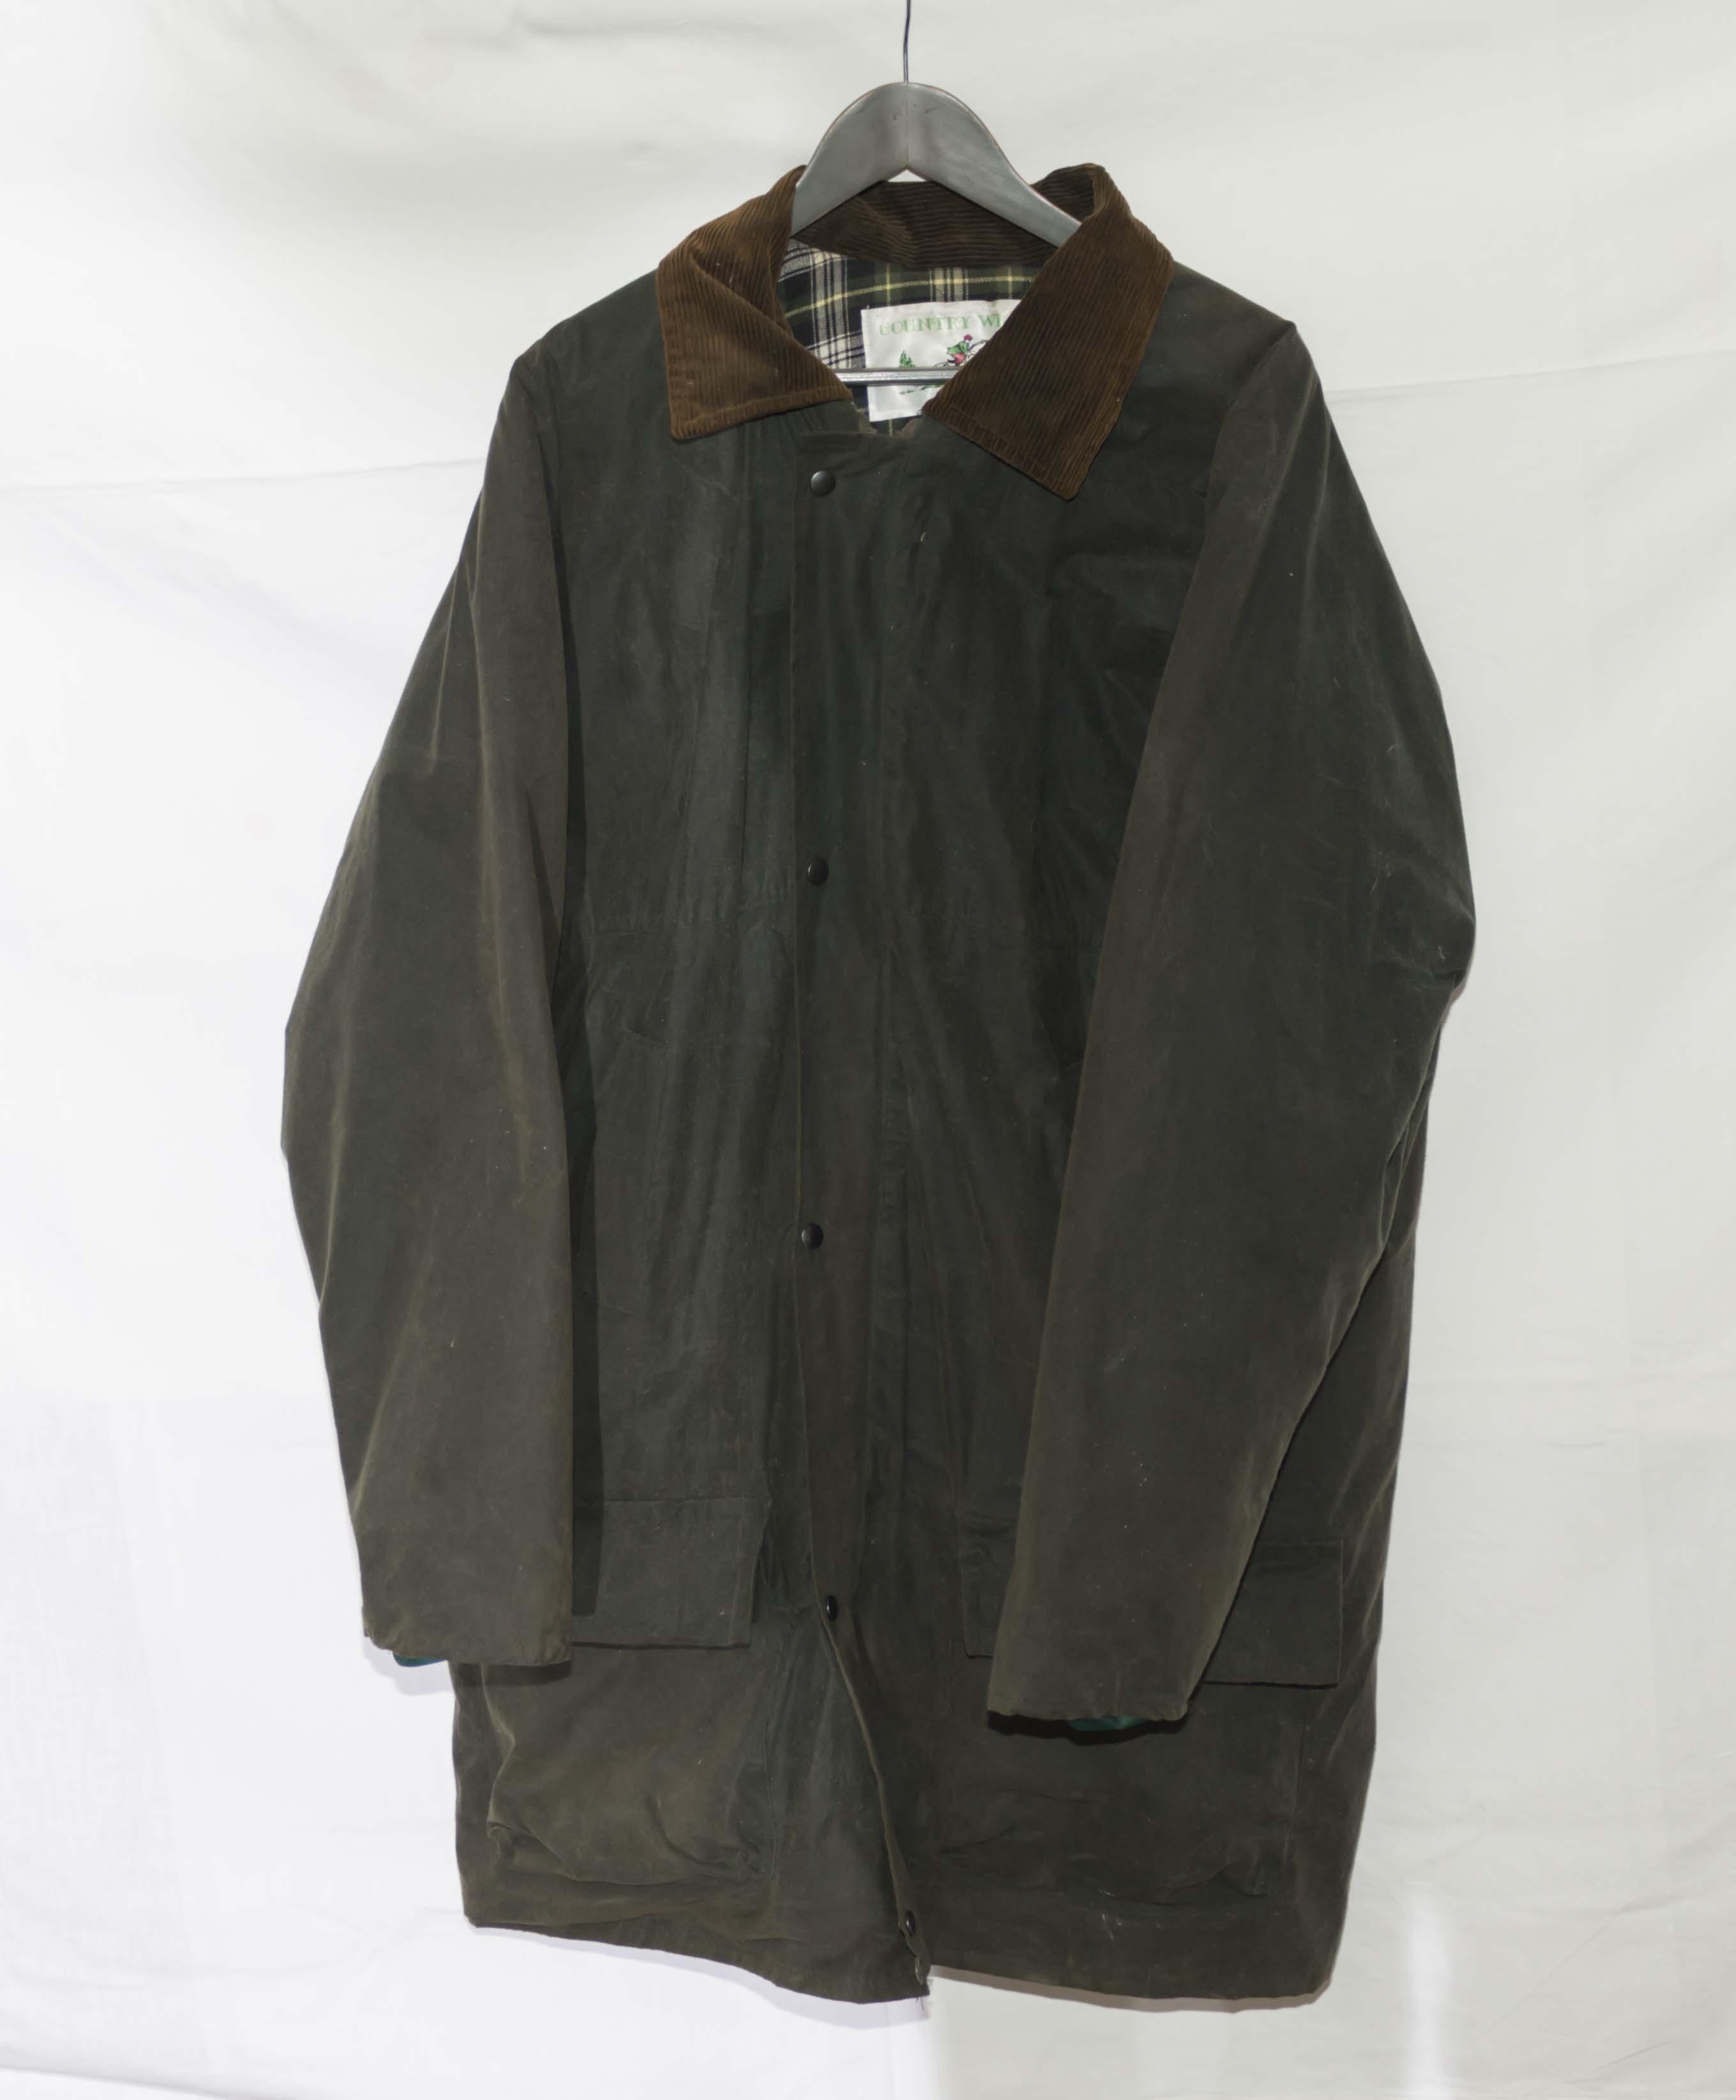 Lot 38 - A gent's wax jacket